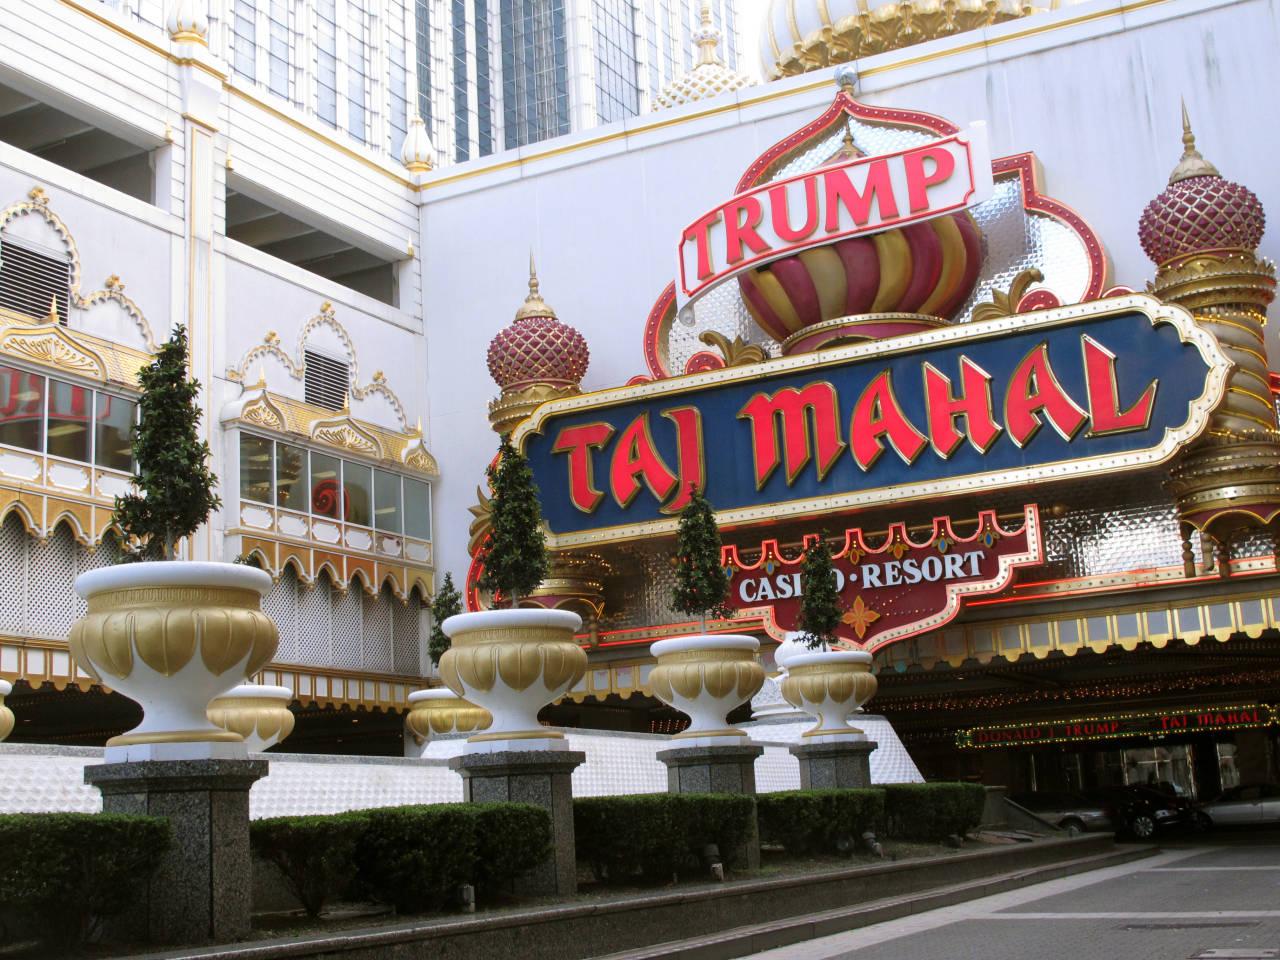 Trump taj mahal in atlantic city to close after labor day for Taj mahal online casino